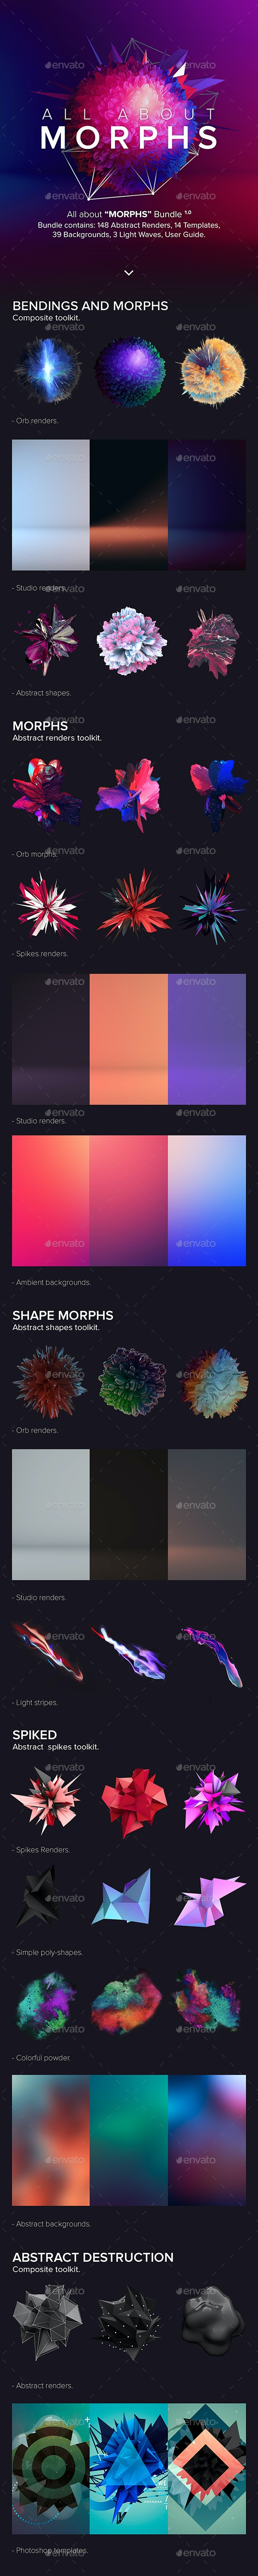 "All about ""MORPHS"" Bundle - Decorative Graphics"